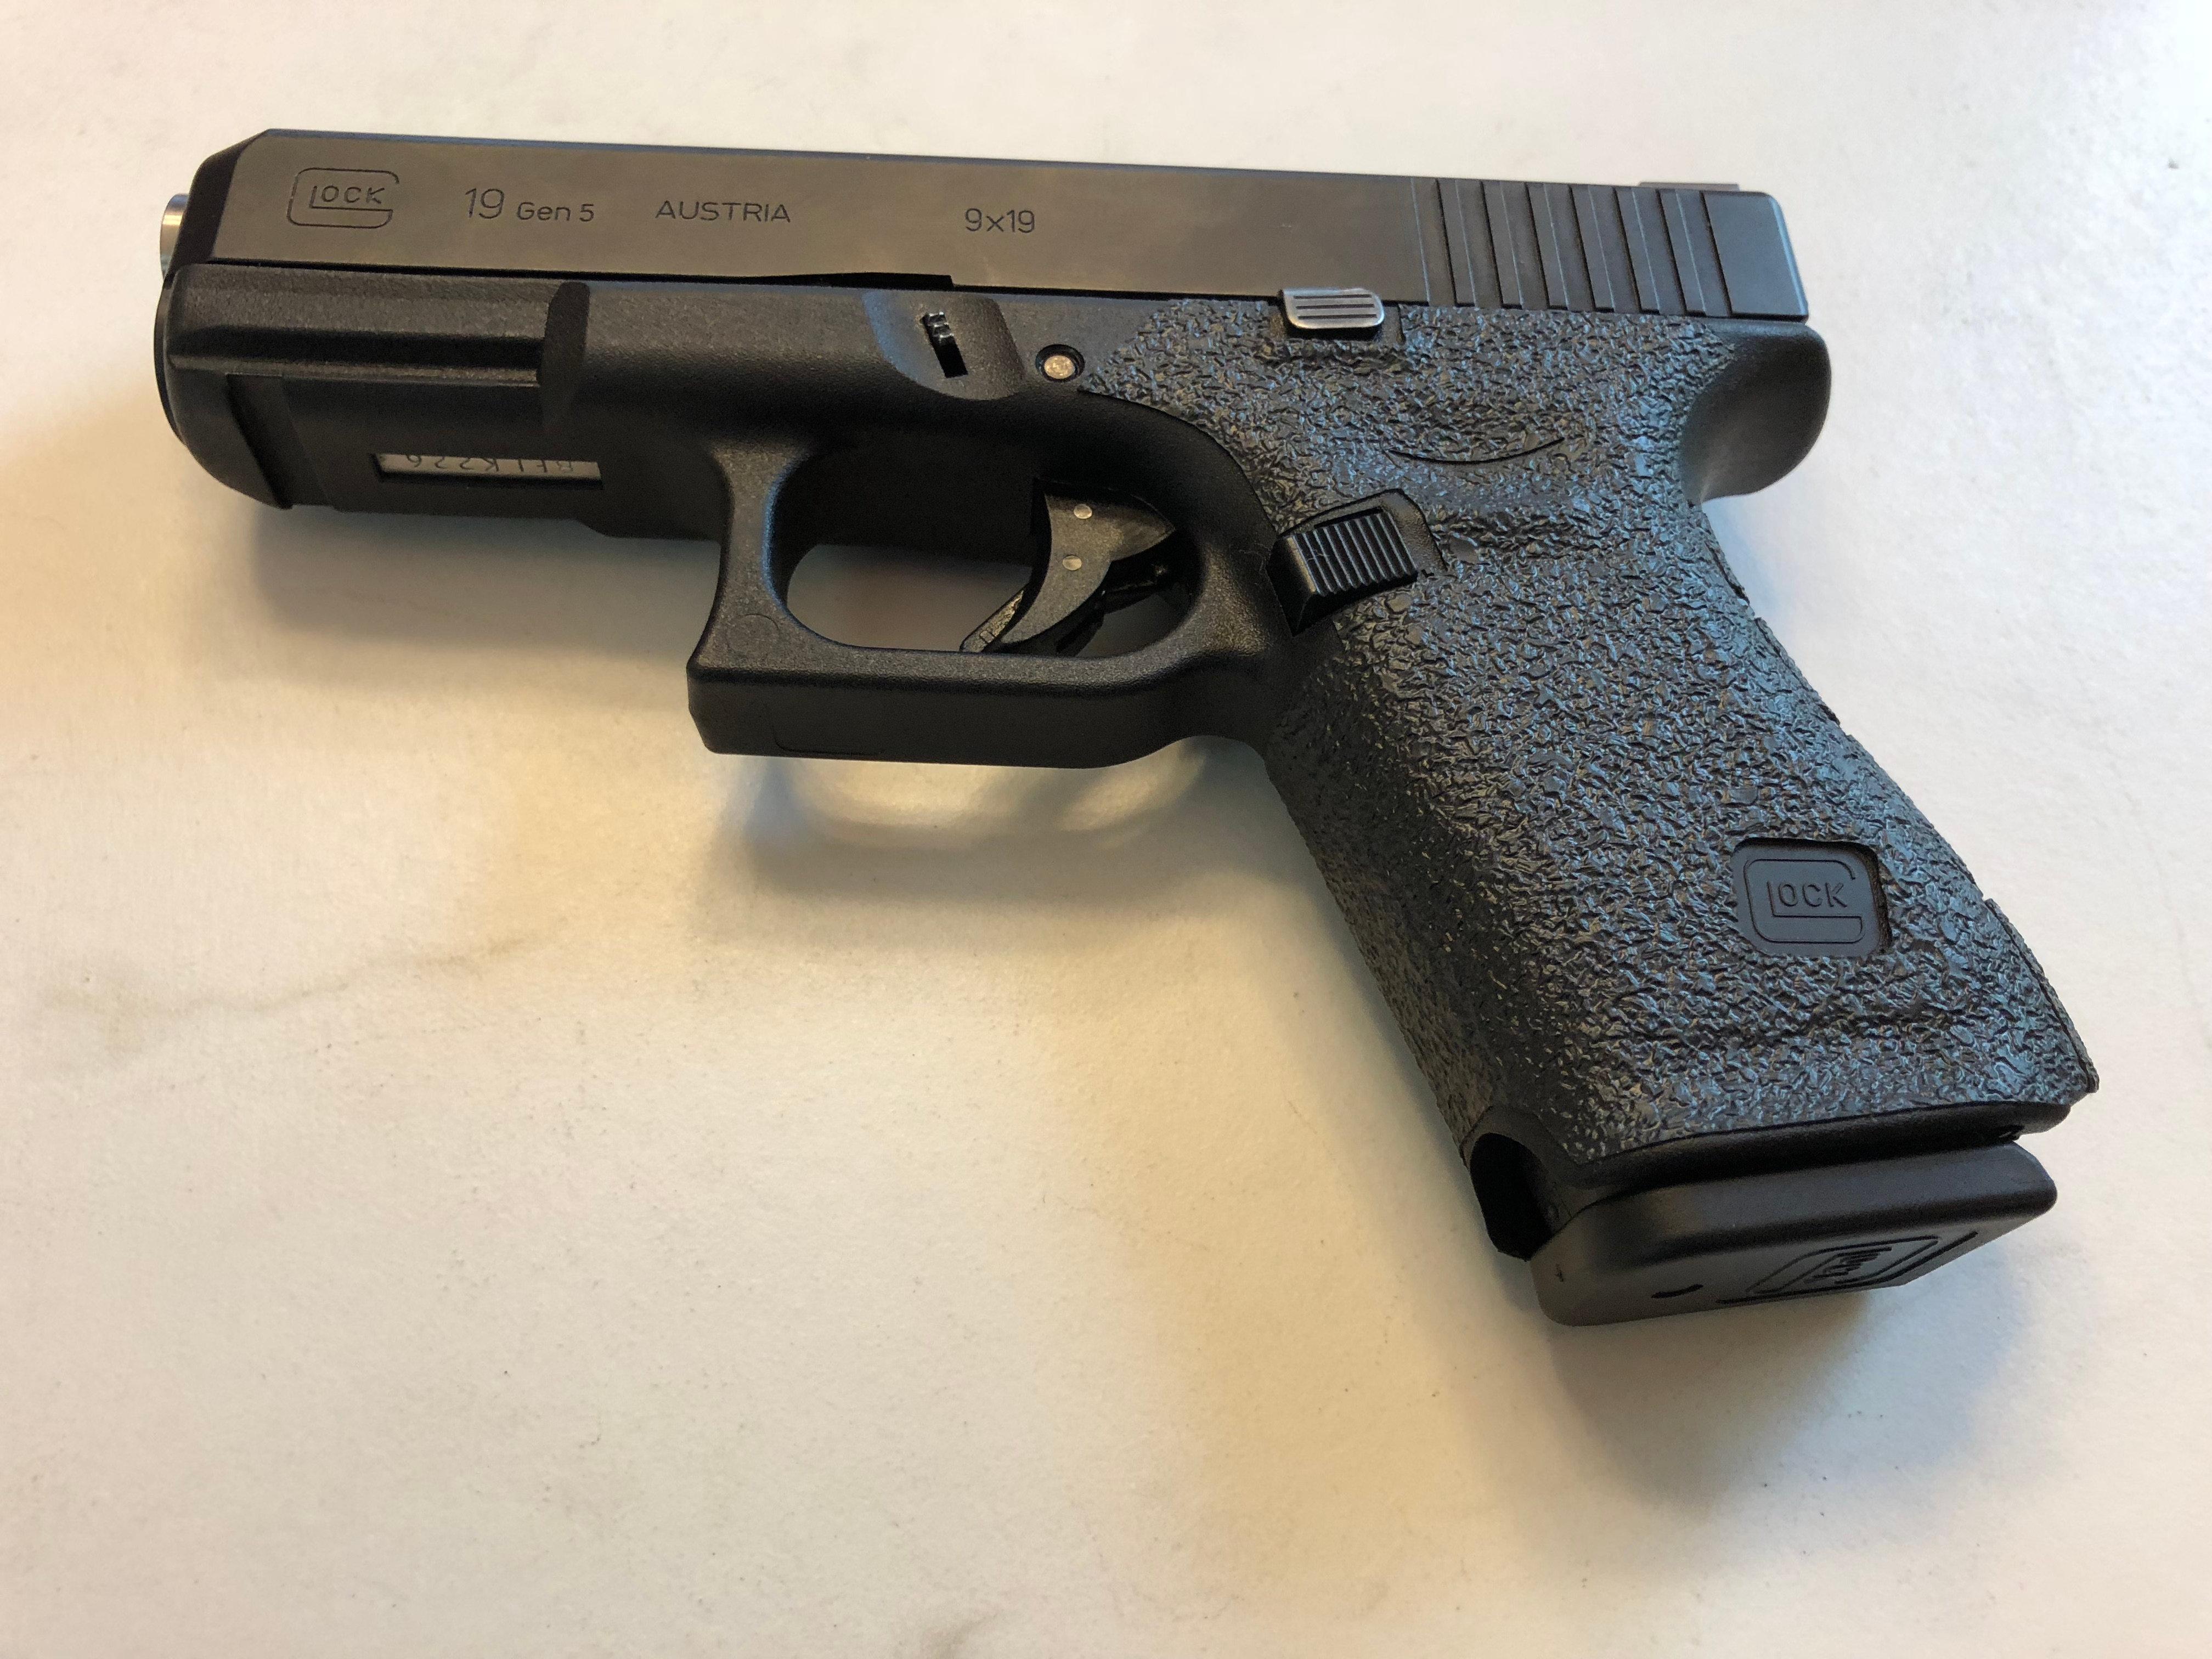 Glock 19/23 Gen 5 MOS Textured Rubber Grip Enhancement